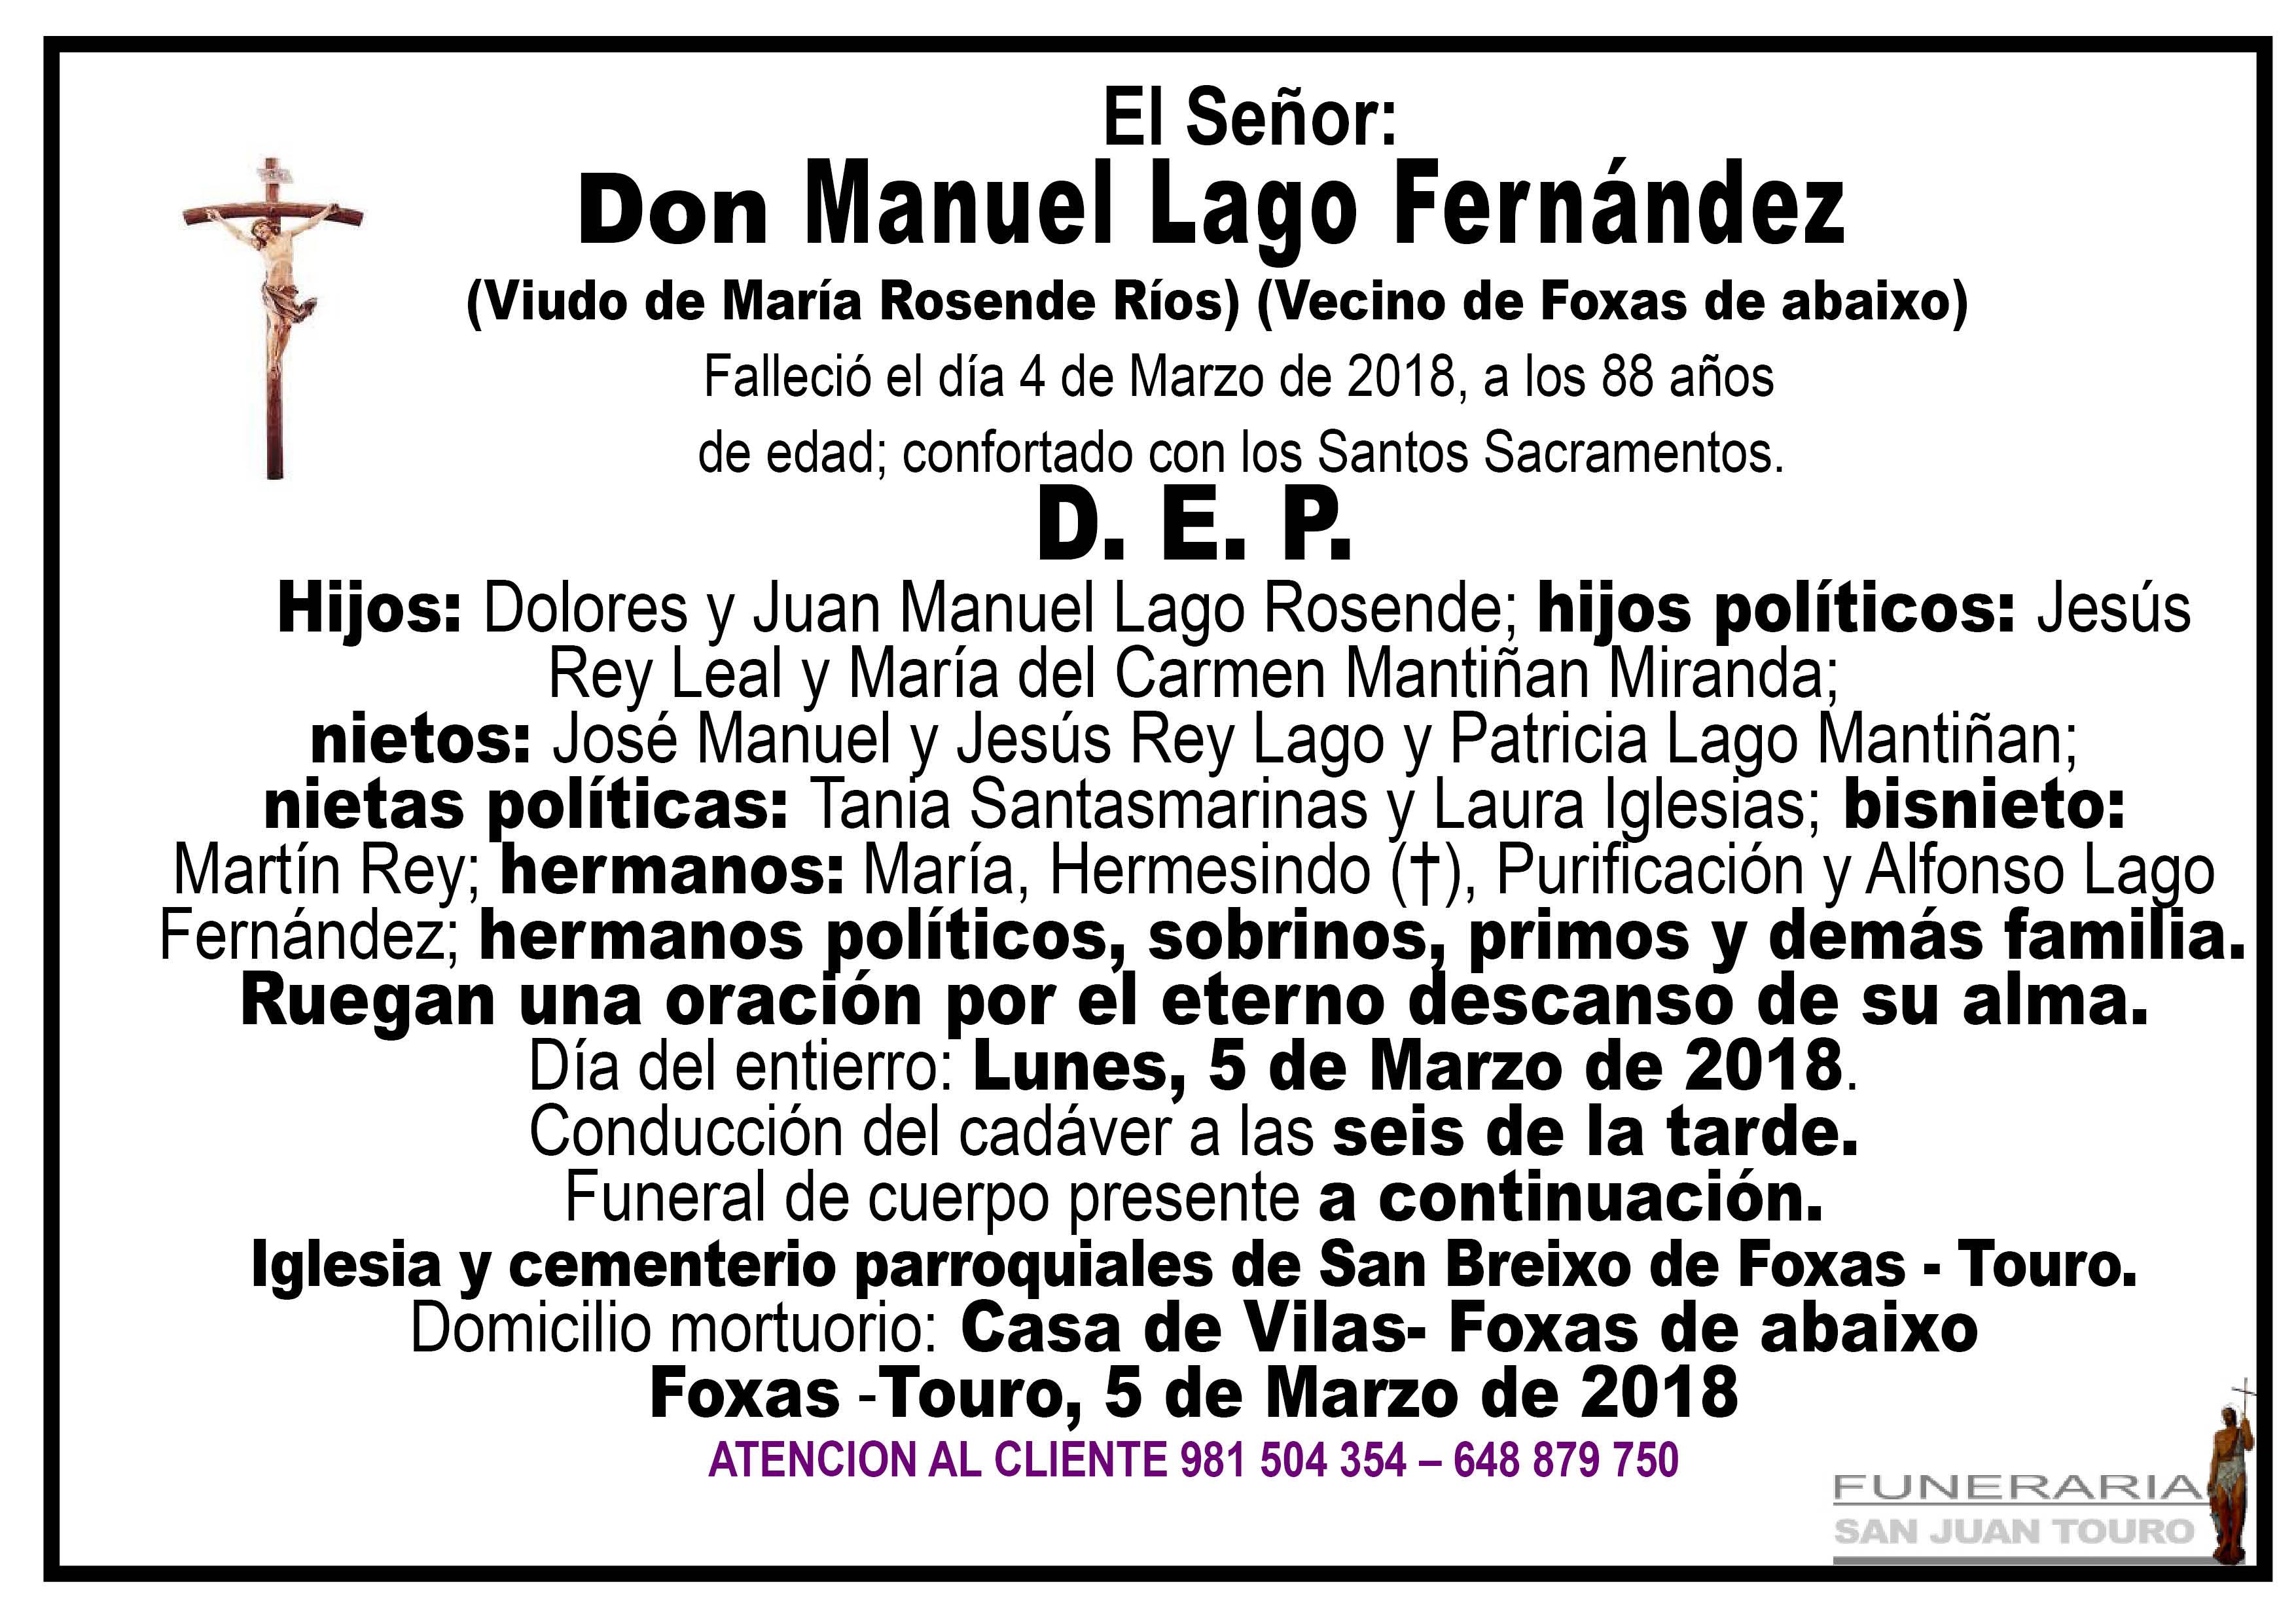 Esquela de SEPELIO DE DON MANUEL LAGO FERNÁNDEZ